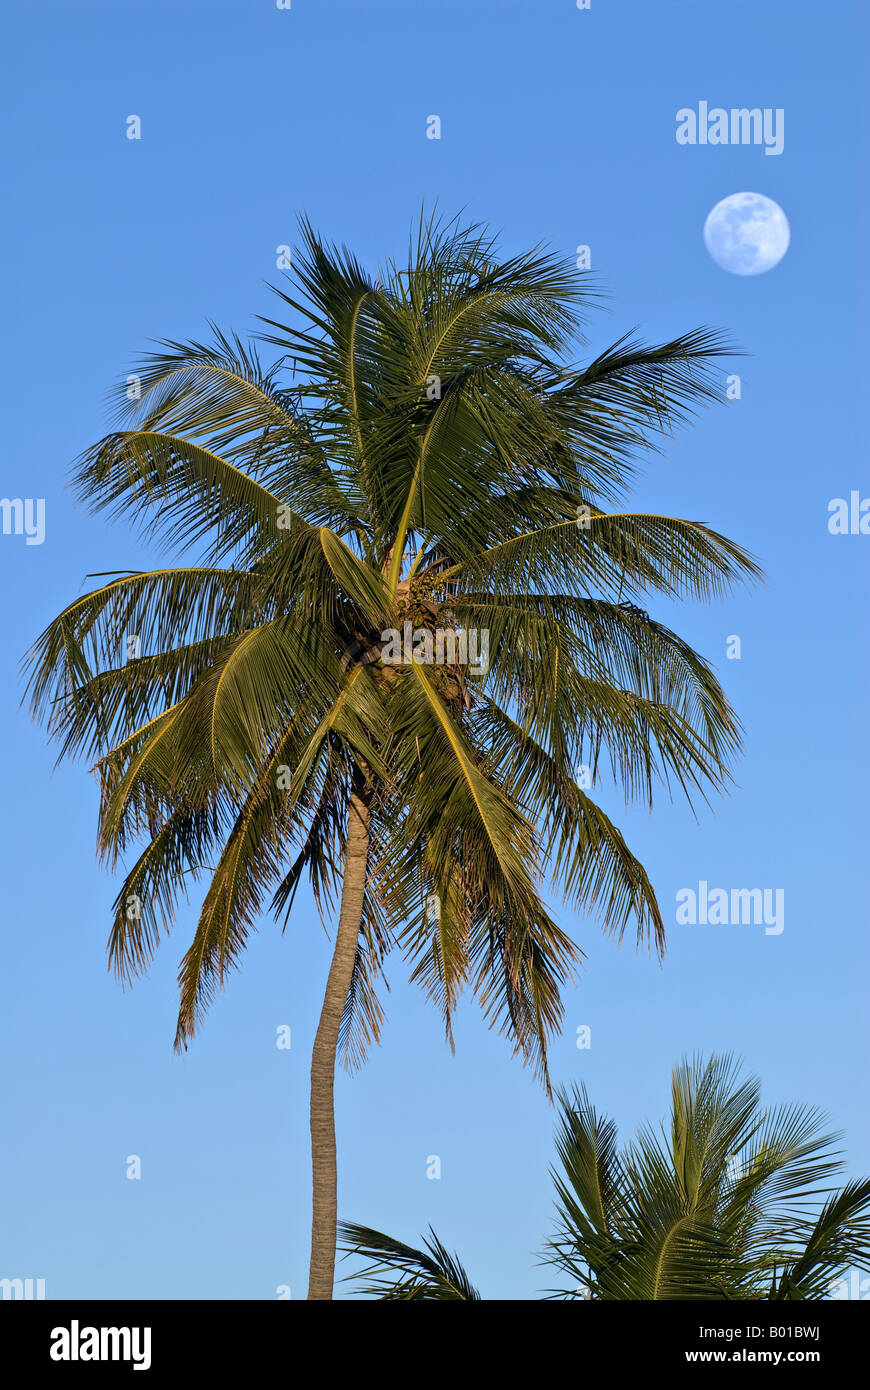 Beach side palm tree frames full moon in clear blue sky, Bahia Honda ...